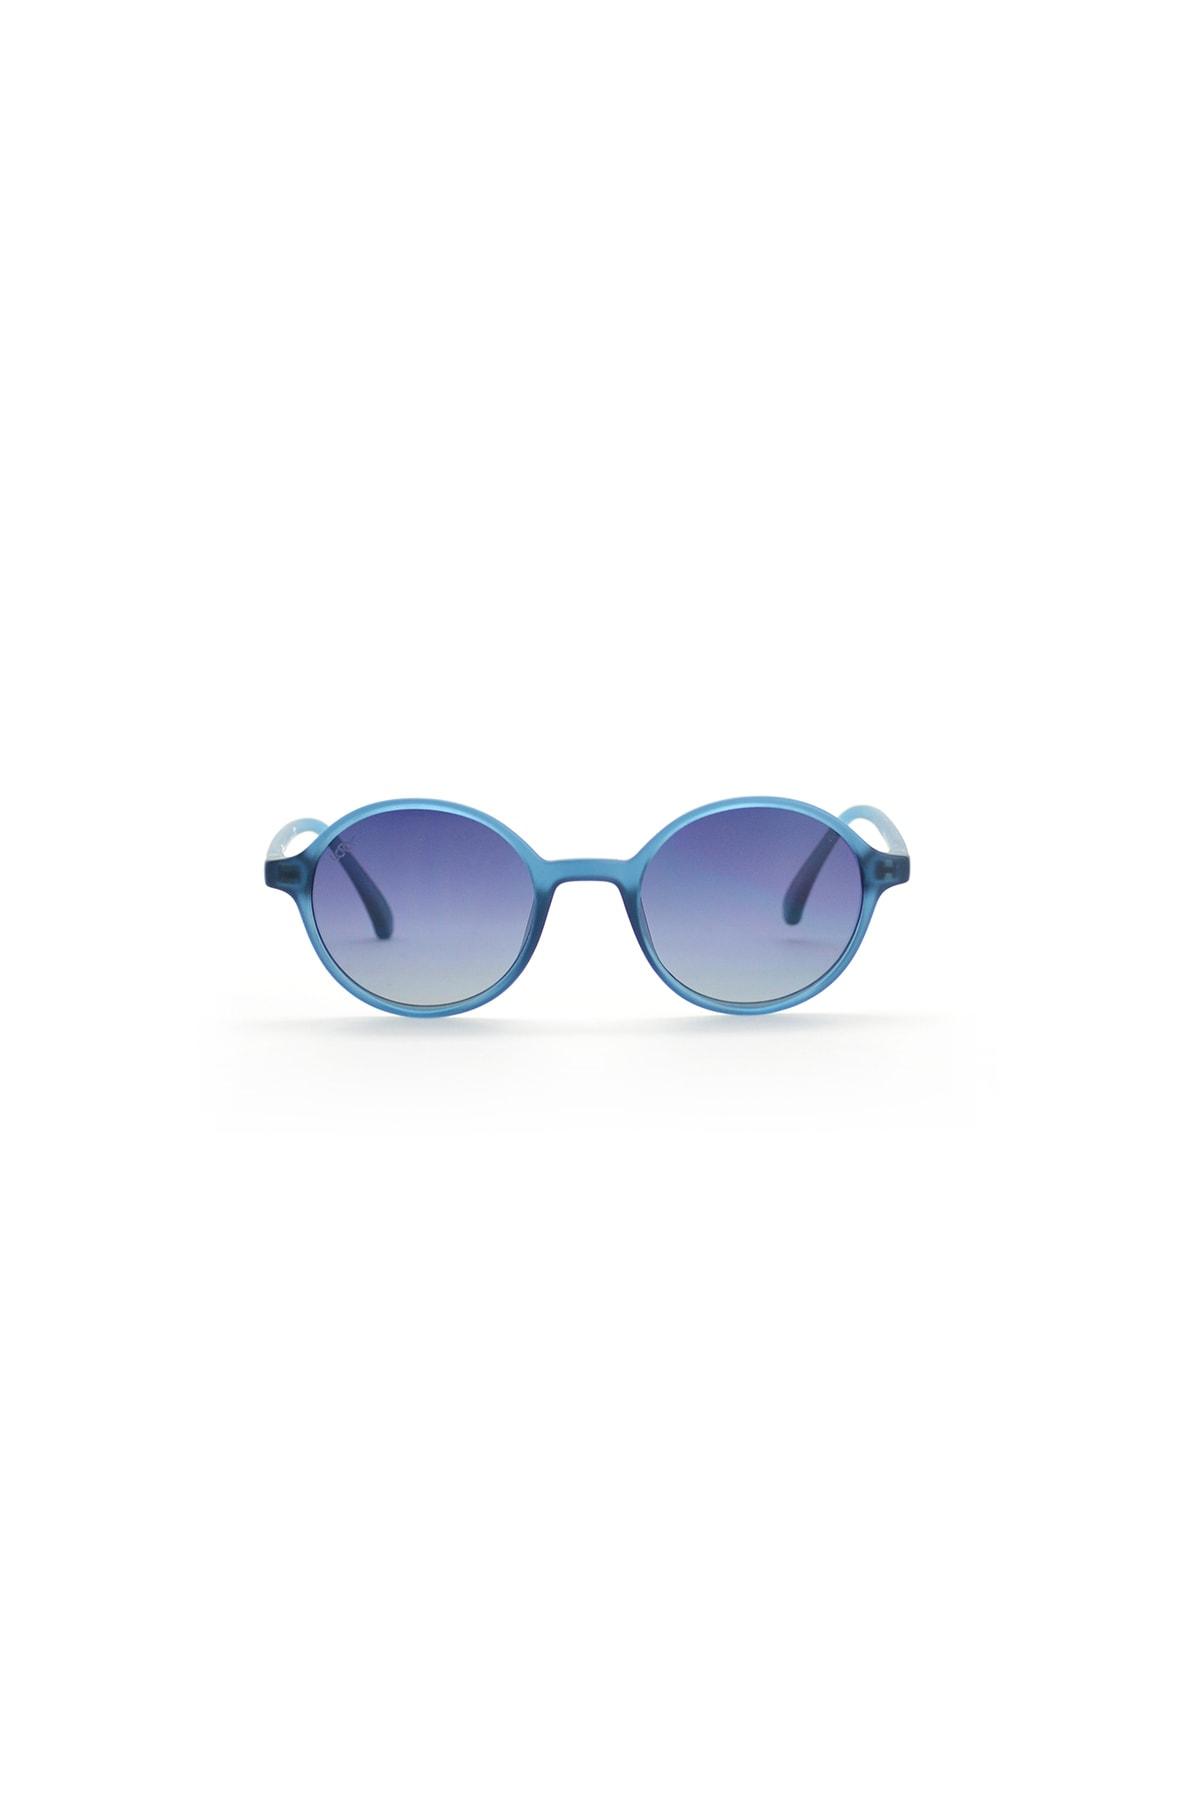 عینک آفتابی فانتزی پسرانه برند LOOKlight رنگ لاجوردی کد ty38514567